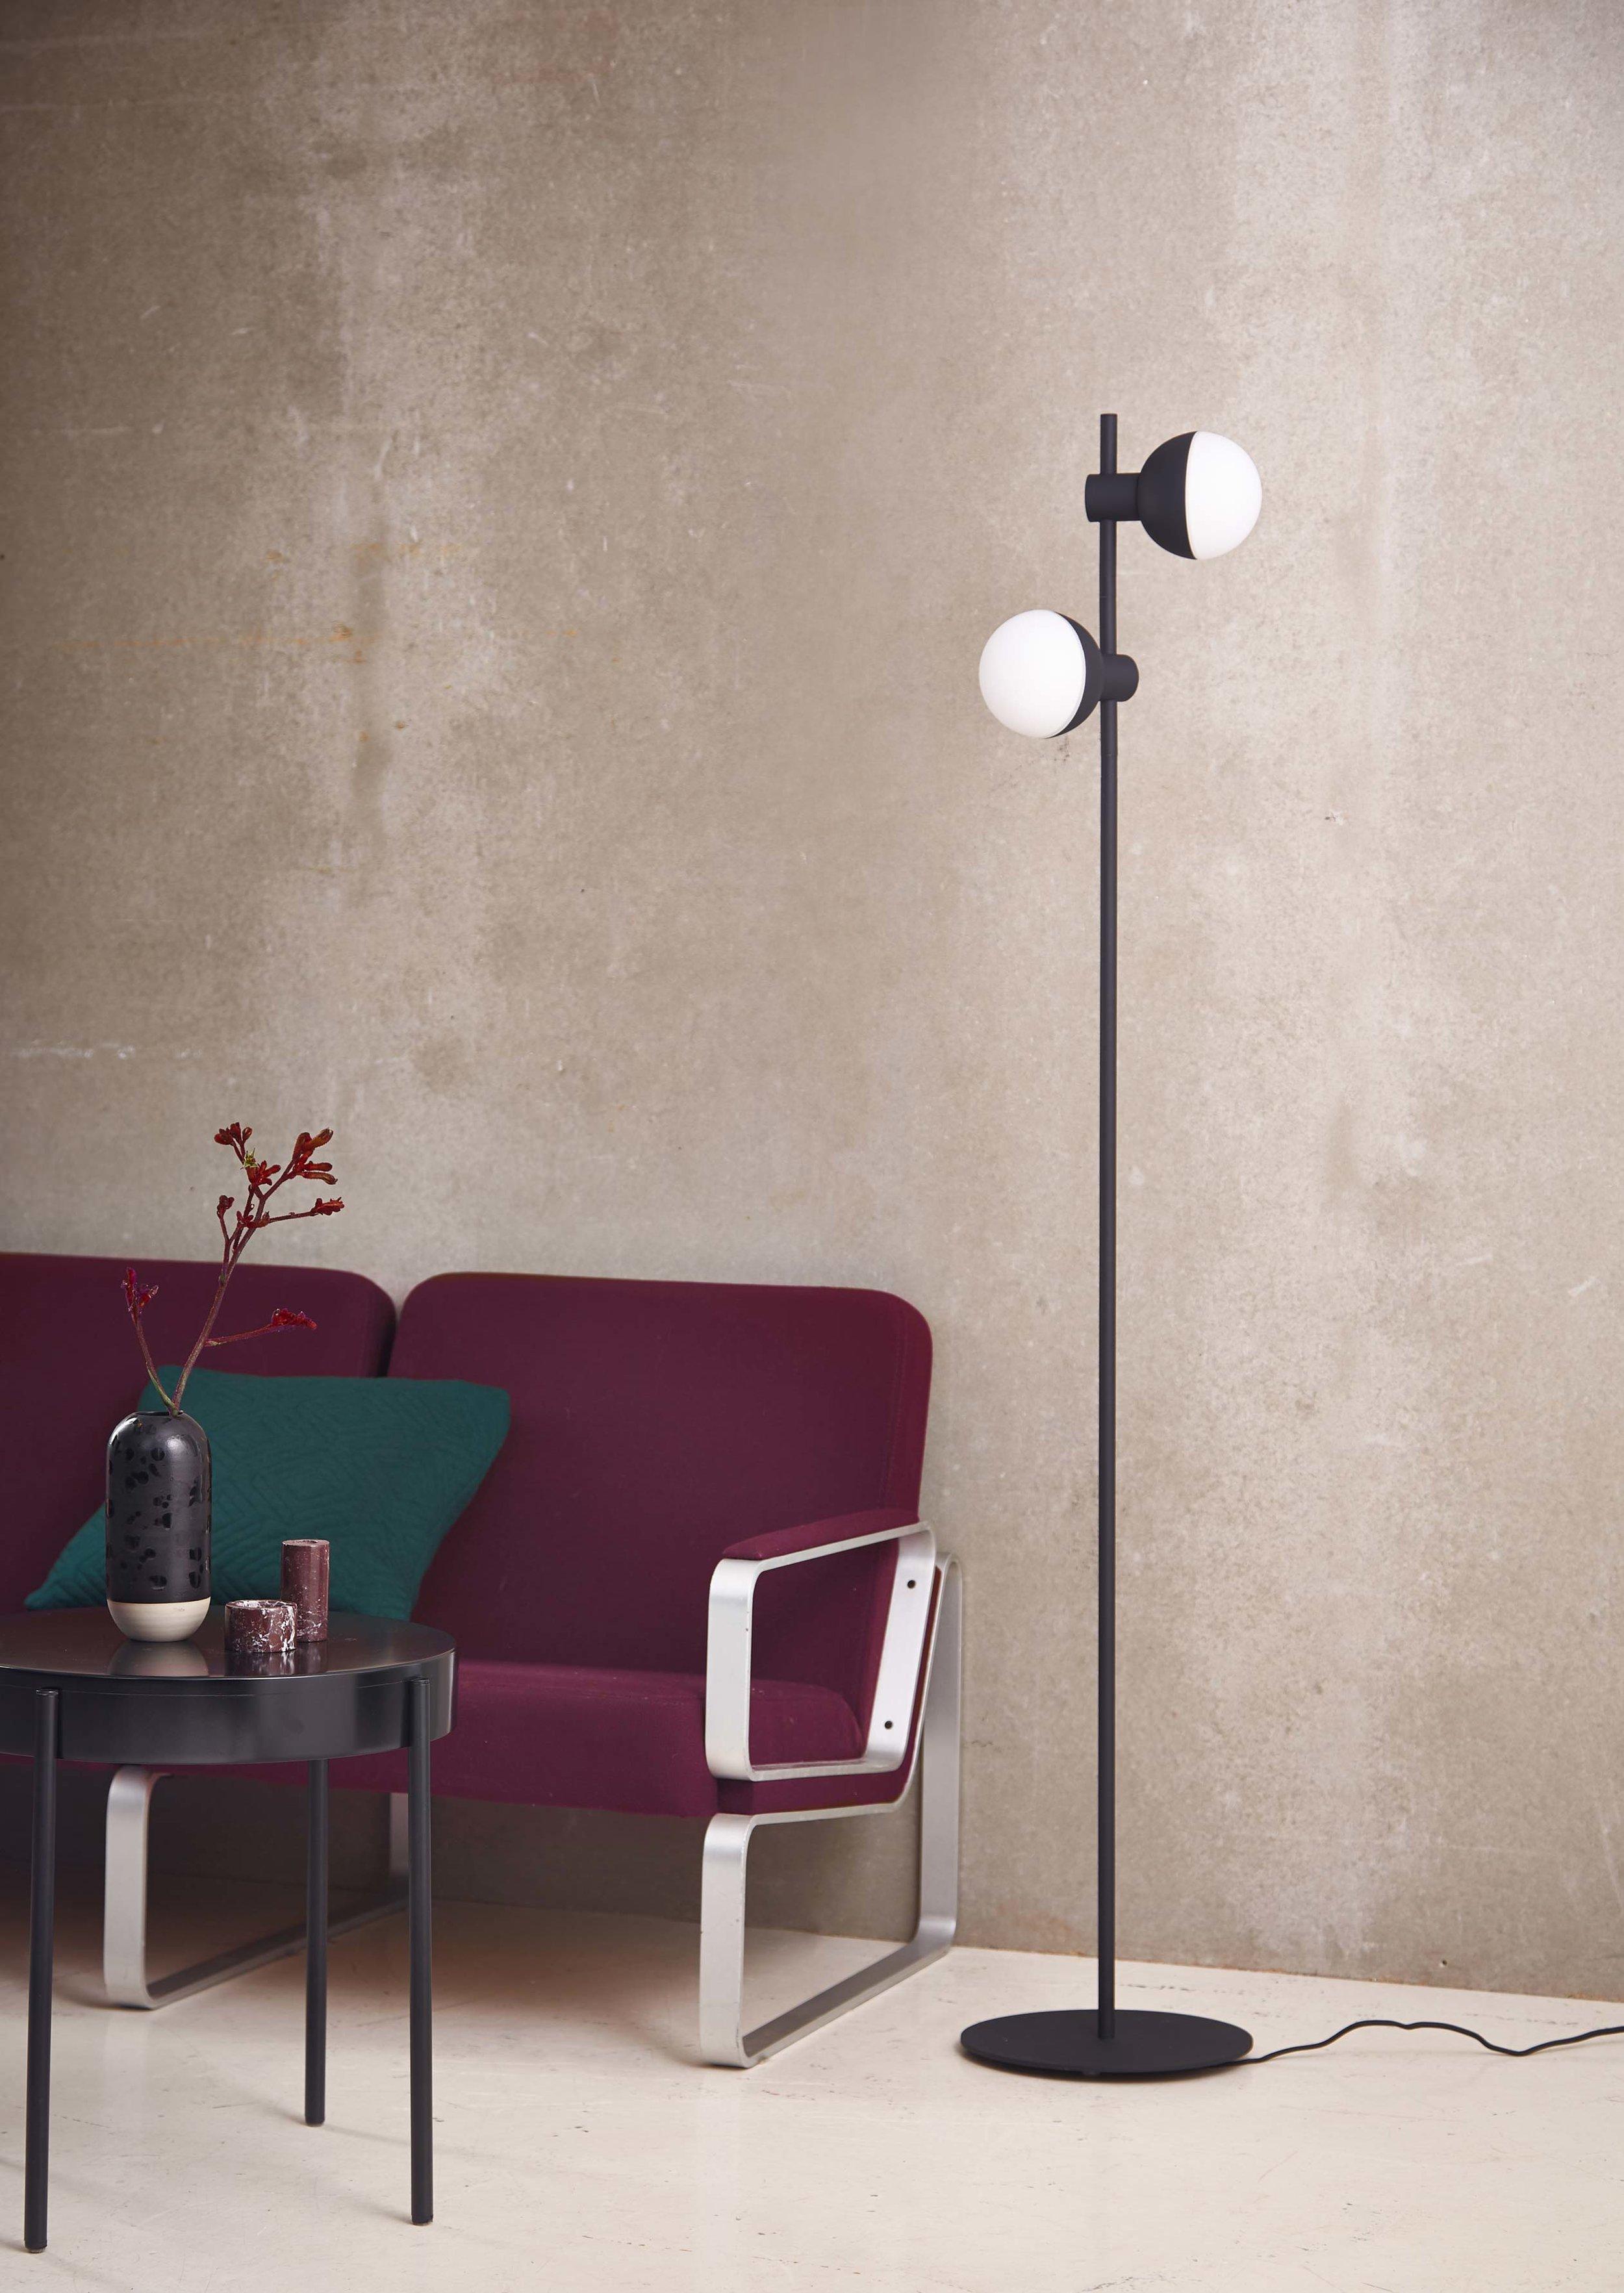 Fabian-floor-lamp-structure-black---lifestyle-Horsens-studio-3505.jpg